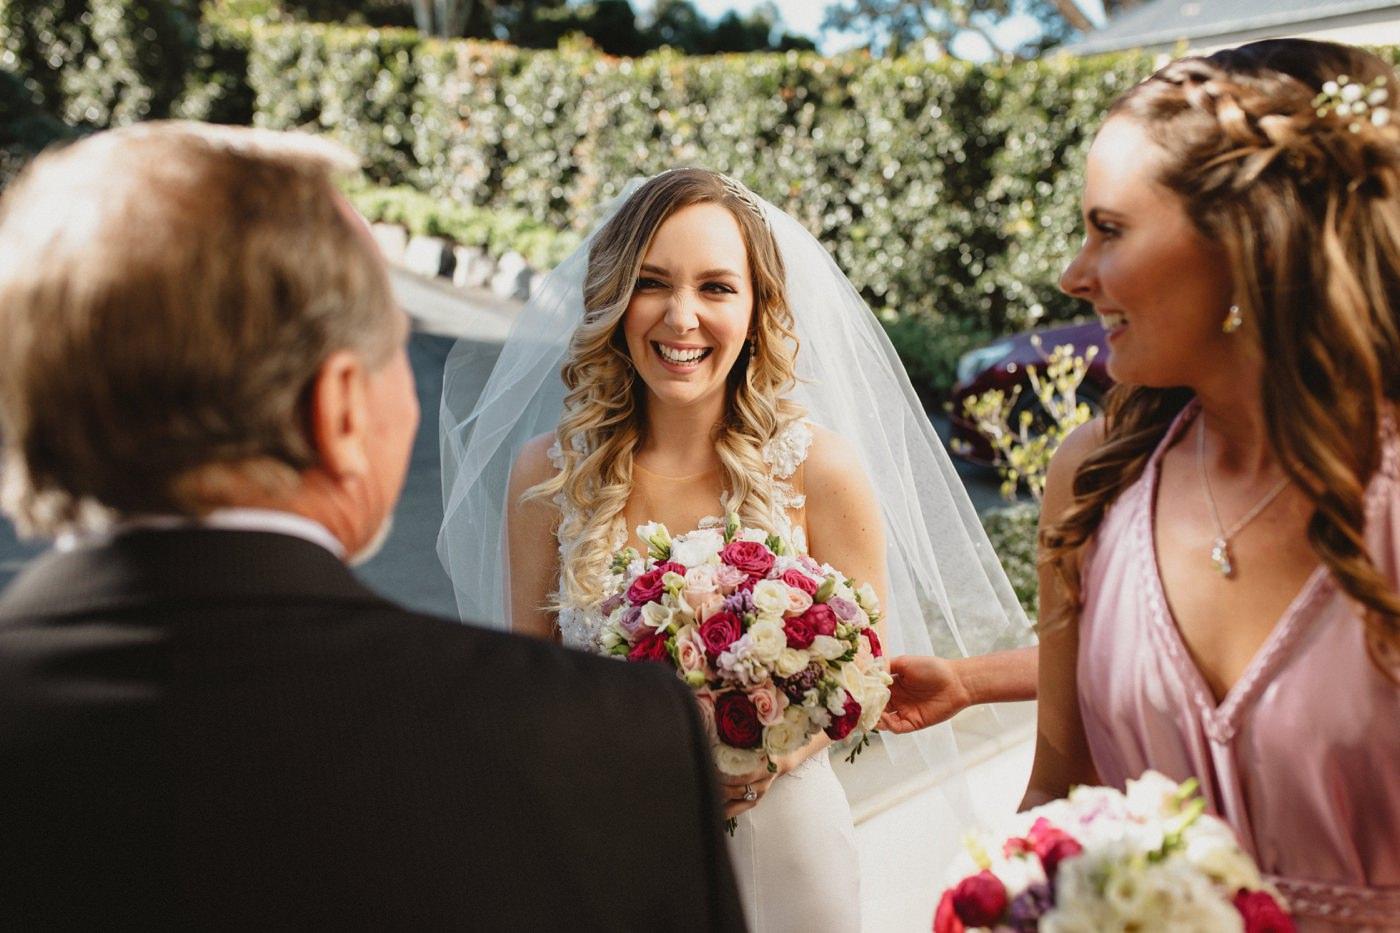 Weddings at Tiffany's